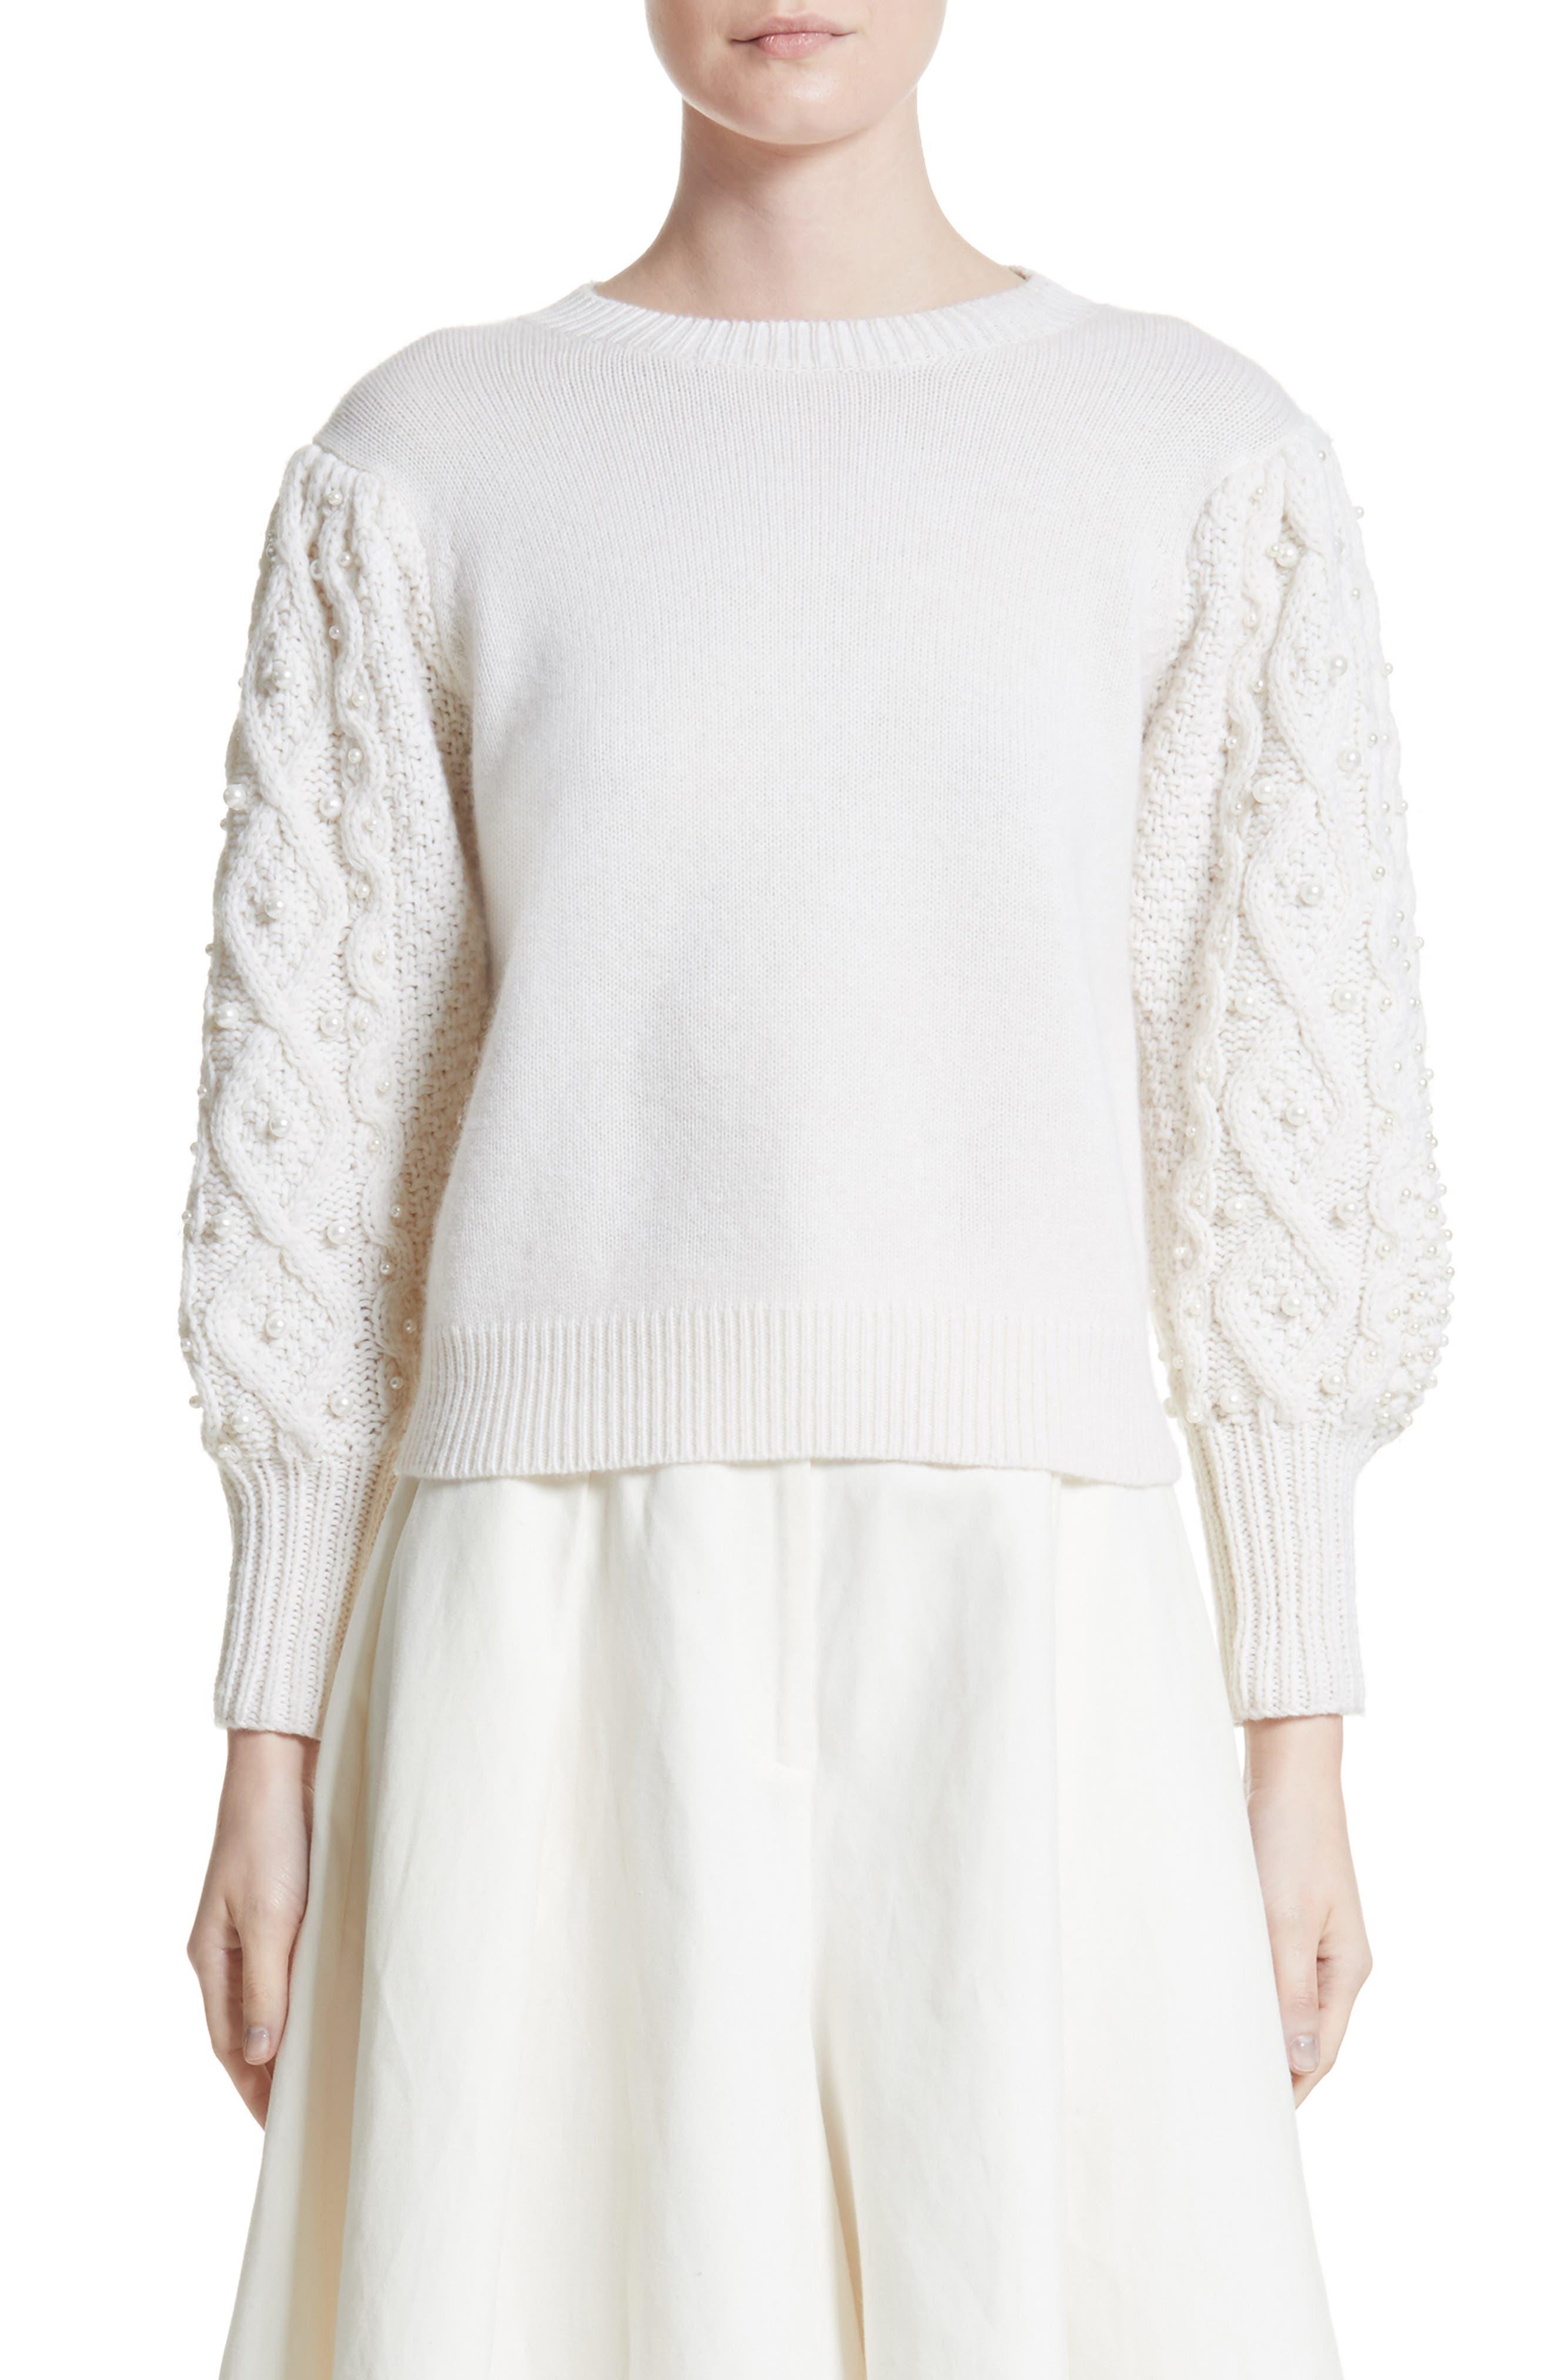 Main Image - Co Imitation Pearl Embellished Wool & Cashmere Sweater